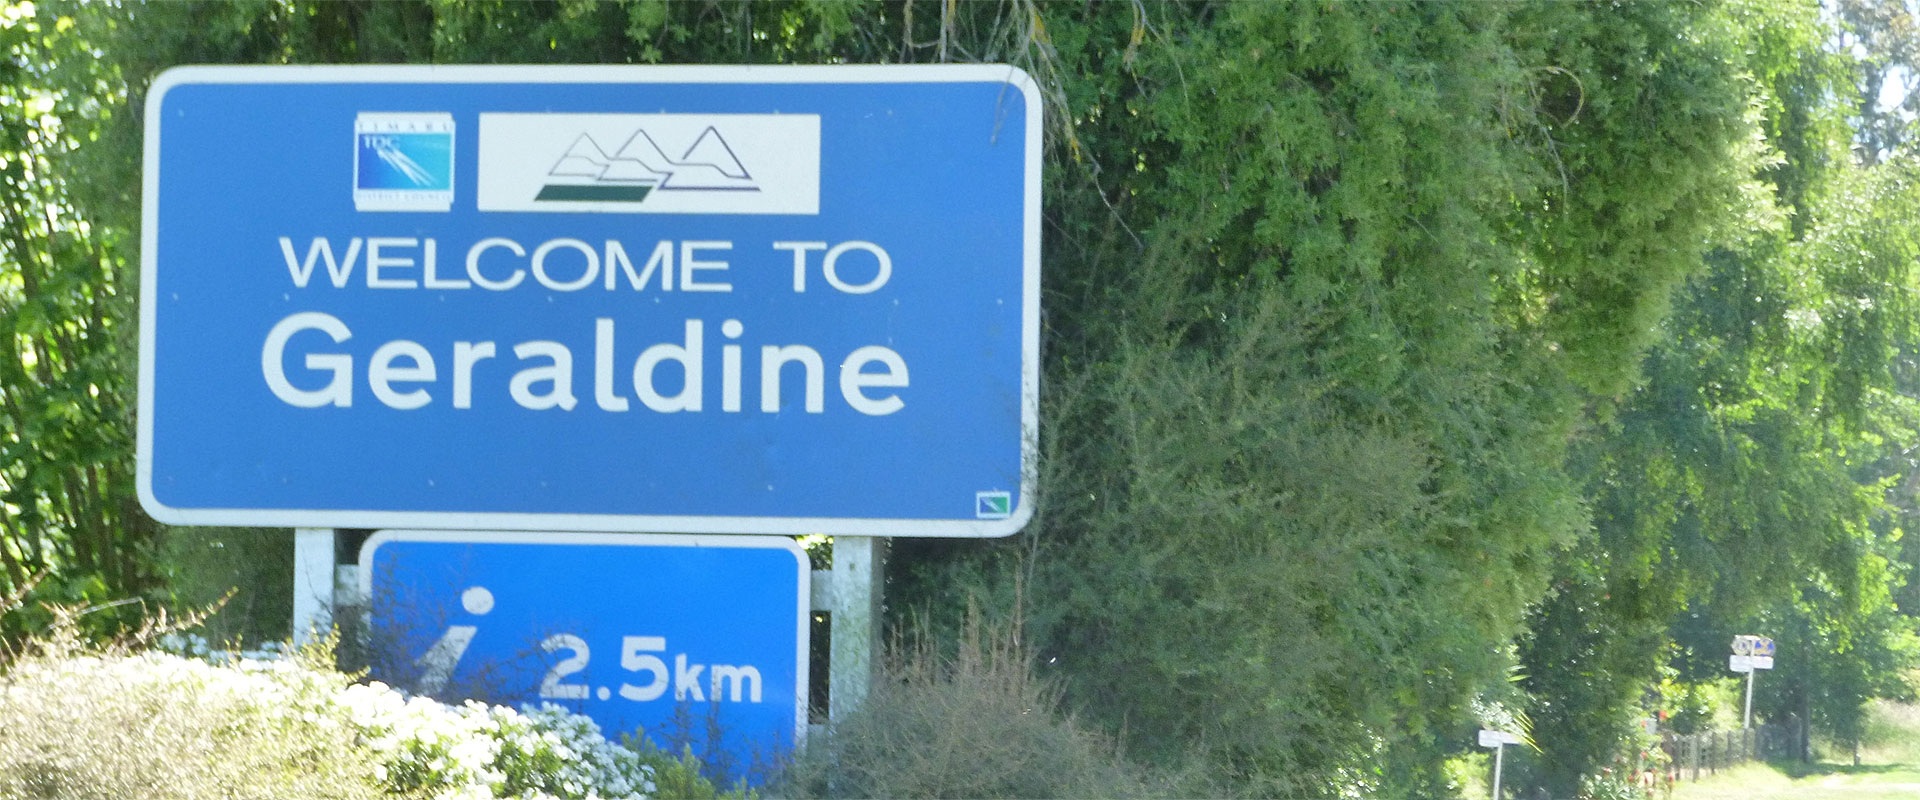 geraldine, new zealand